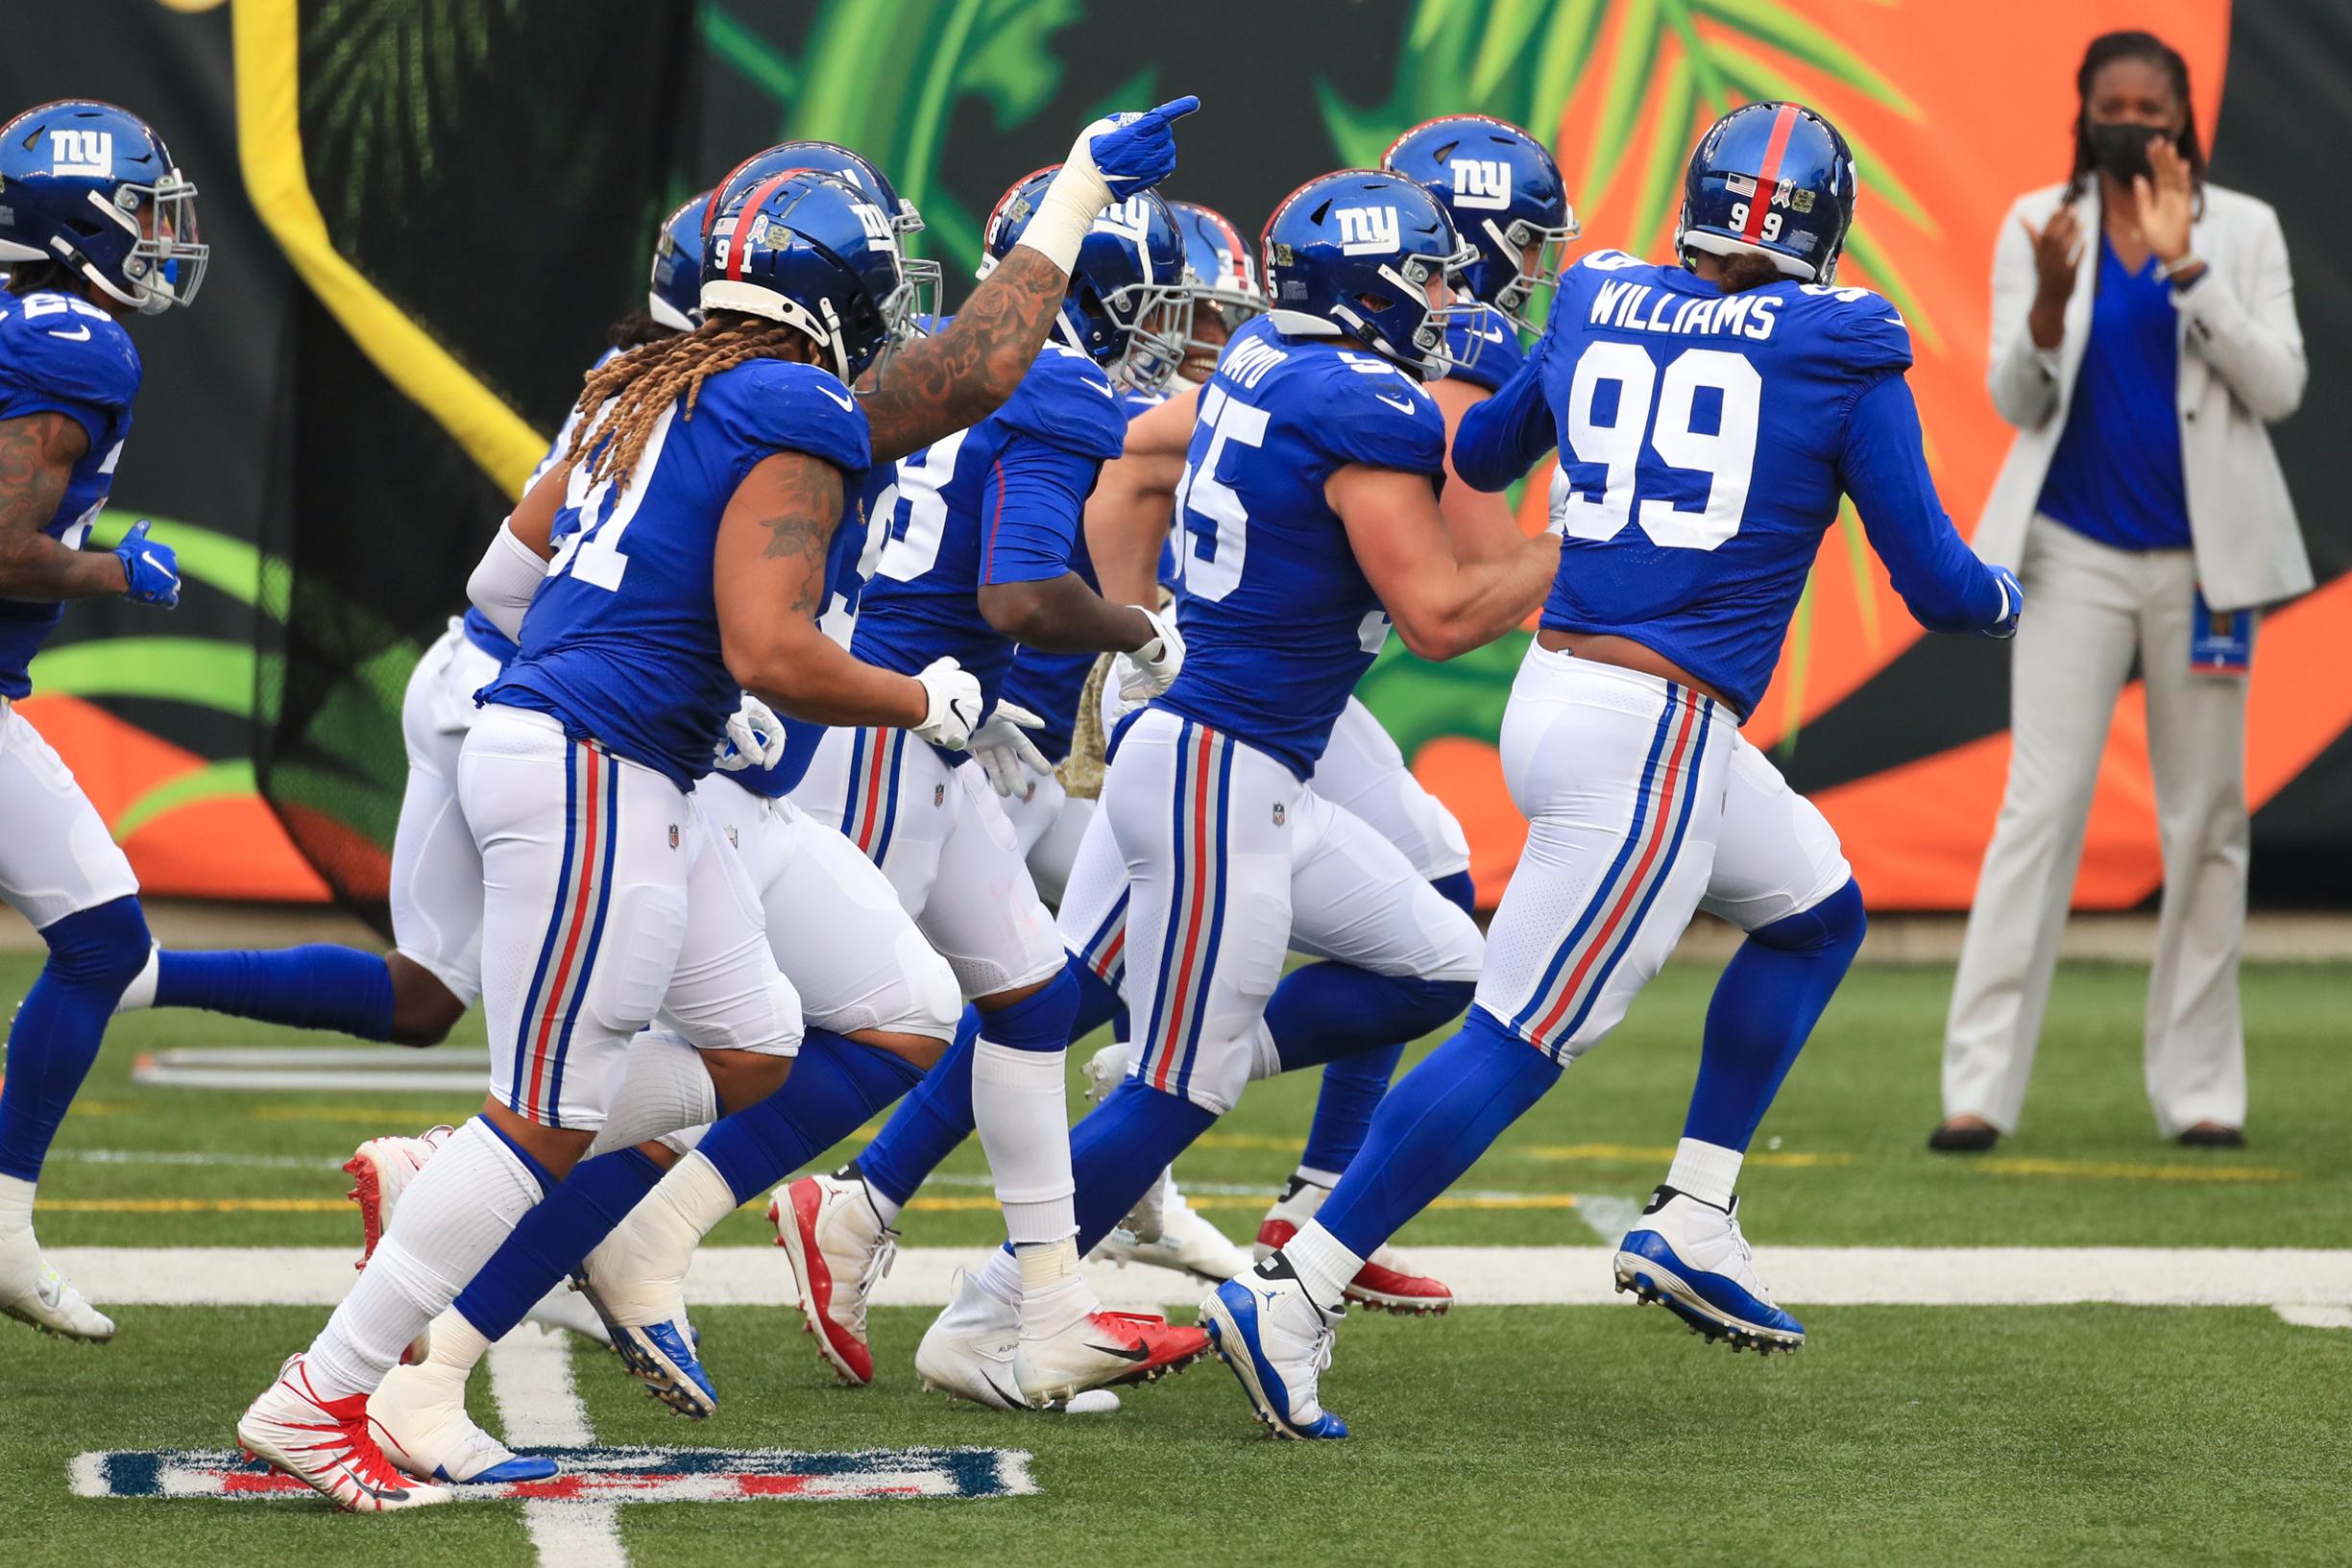 NFL: NOV 29 Giants at Bengals